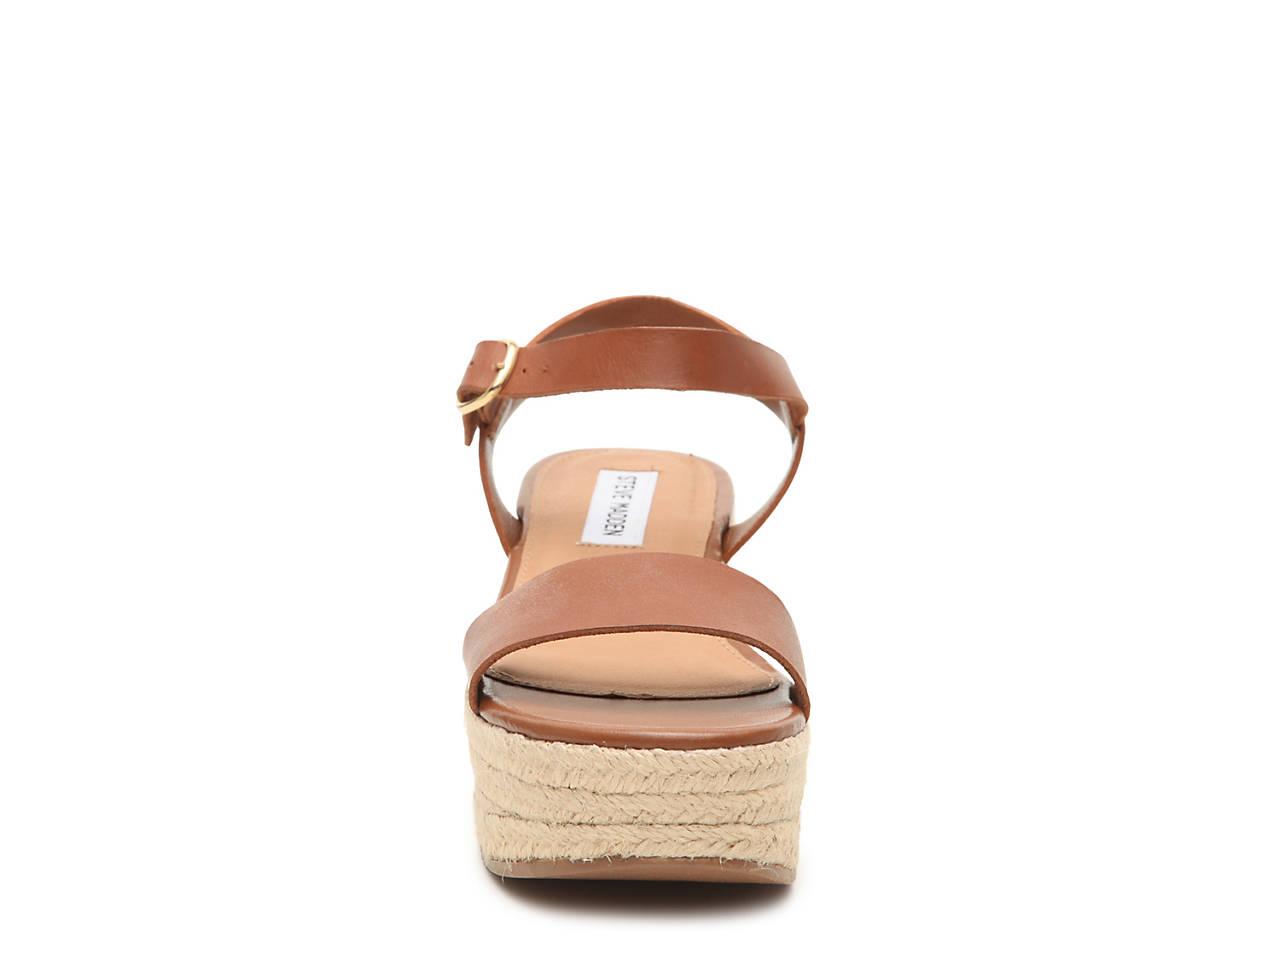 e00cc48d424 Brandice Espadrille Wedge Sandal